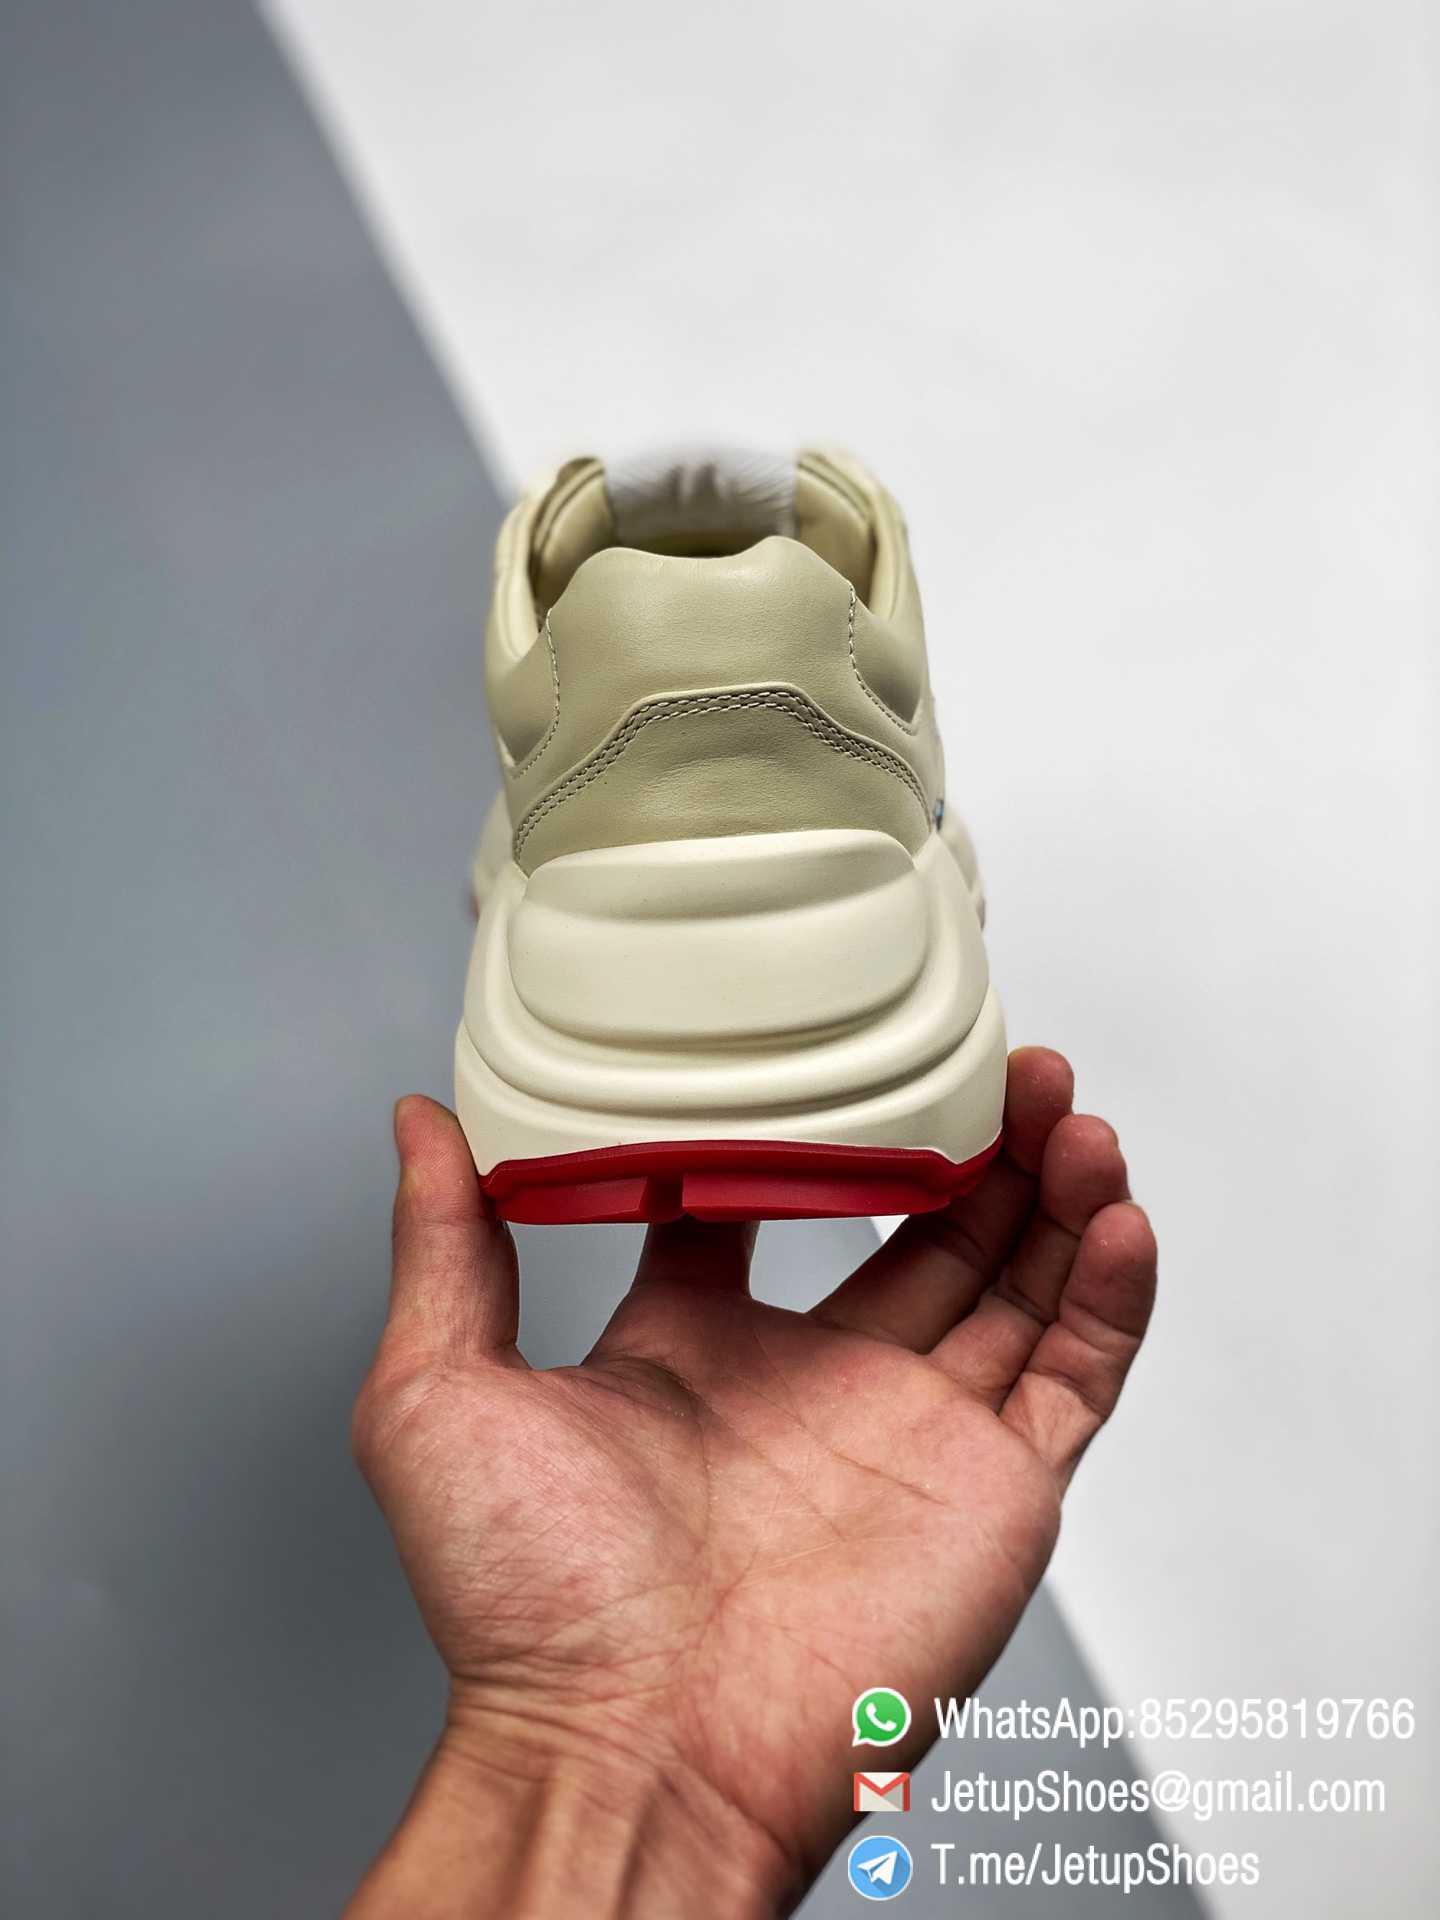 Doraemon x Gucci womens Rhyton Sneaker Special Collaboration Sneakers SKU 655037 DRW00 9522 06